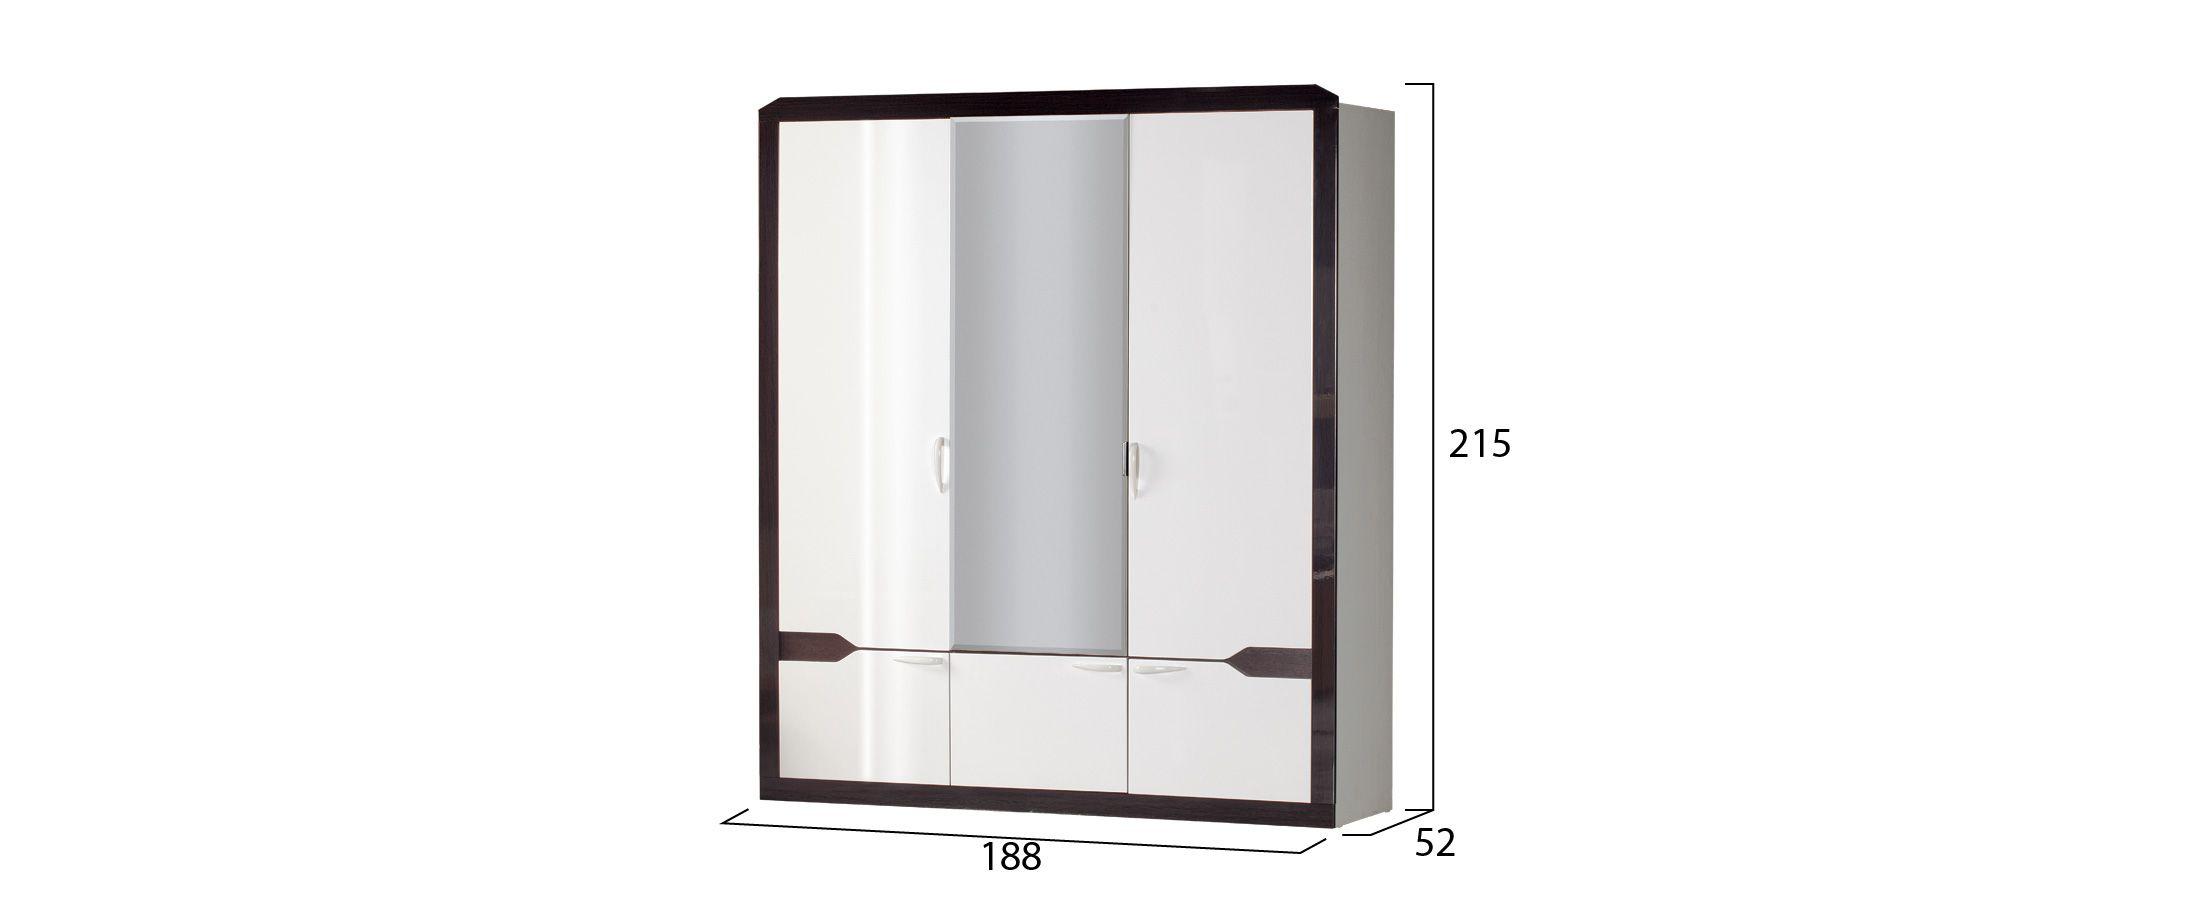 Шкаф 3-дверный Ронда 310Шкаф 3-дверный Ронда 310 Модель 902. Артикул Д000761.<br><br>Ширина см: 188<br>Глубина см: 52<br>Высота см: 215<br>Наличие зеркала: Да<br>Цвет: Белый<br>Цвет корпуса: Белый/Венге<br>Цвет фасада: Белый глянец, Венге глянец<br>Материал фасада: МДФ<br>Материал корпуса: ЛДСП